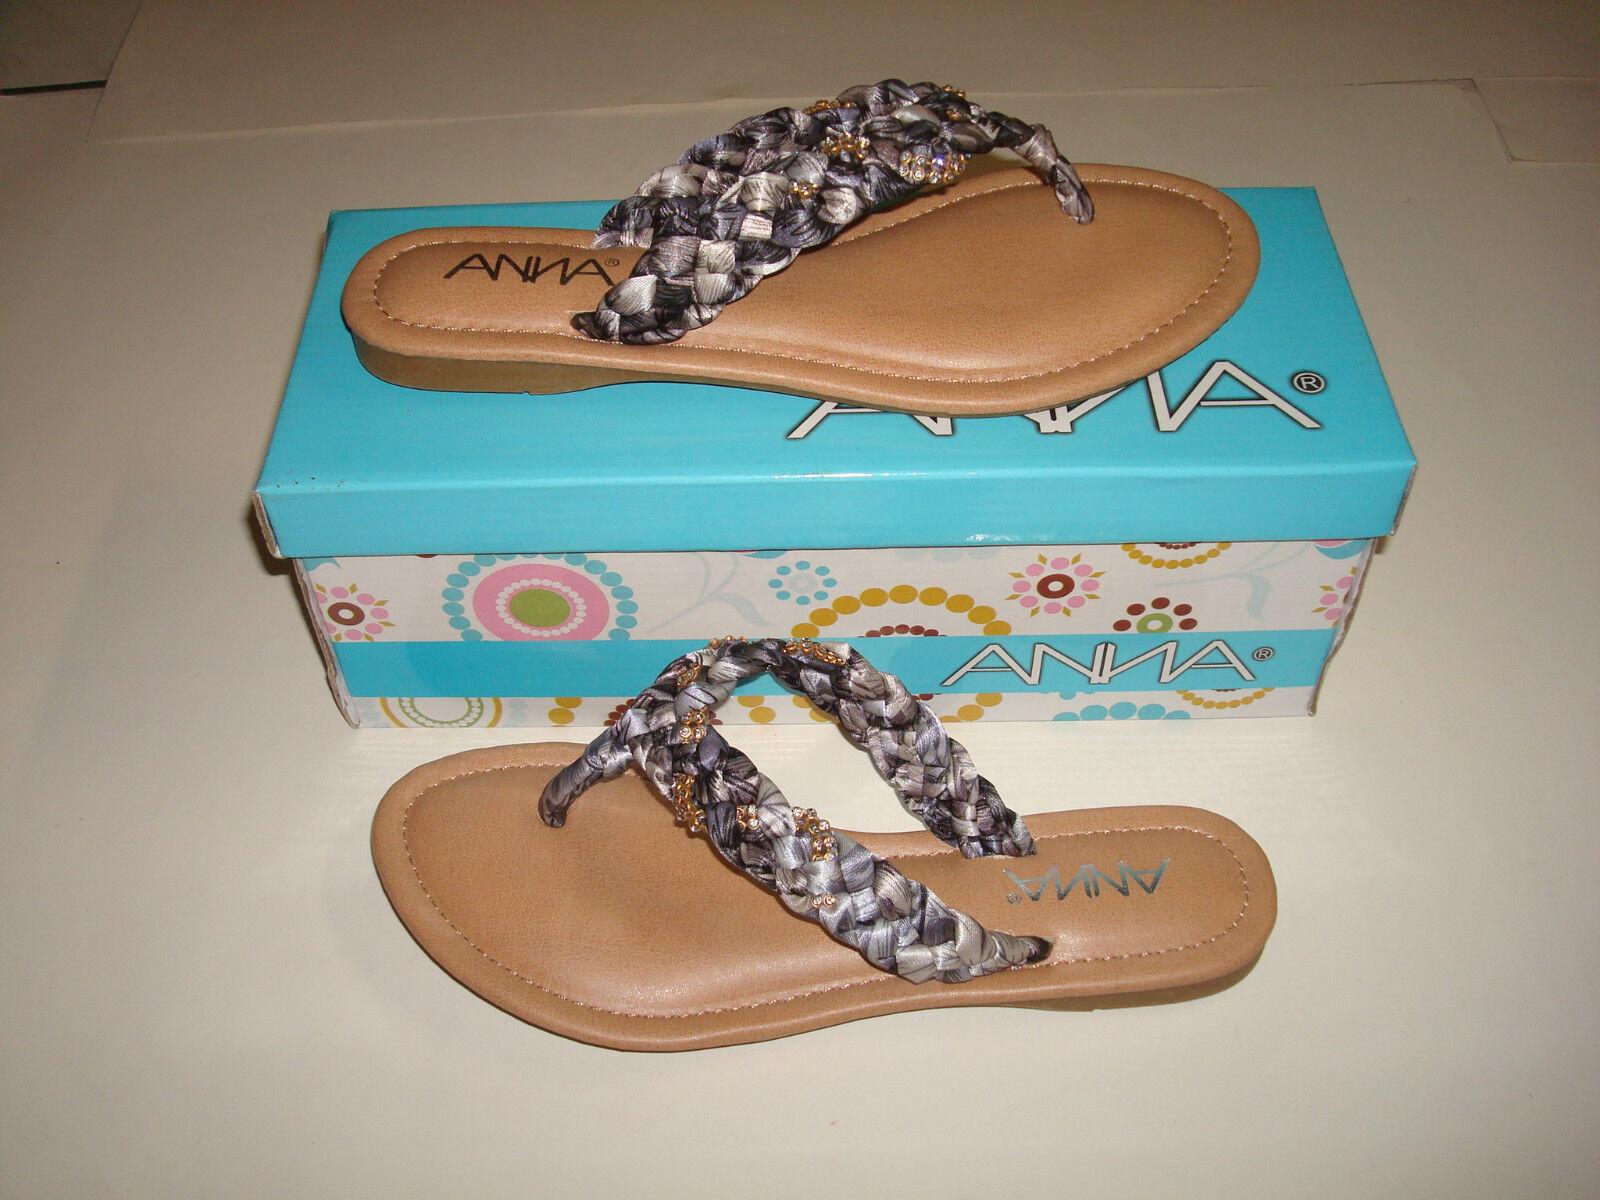 Men's/Women's Slipper NEW Flip Flops Cute Slipper Men's/Women's Comfortable Flat Shoes NEW COLOR Sandal SUMMER SALE High security Attractive fashion Full range of specifications GG388 7239bd